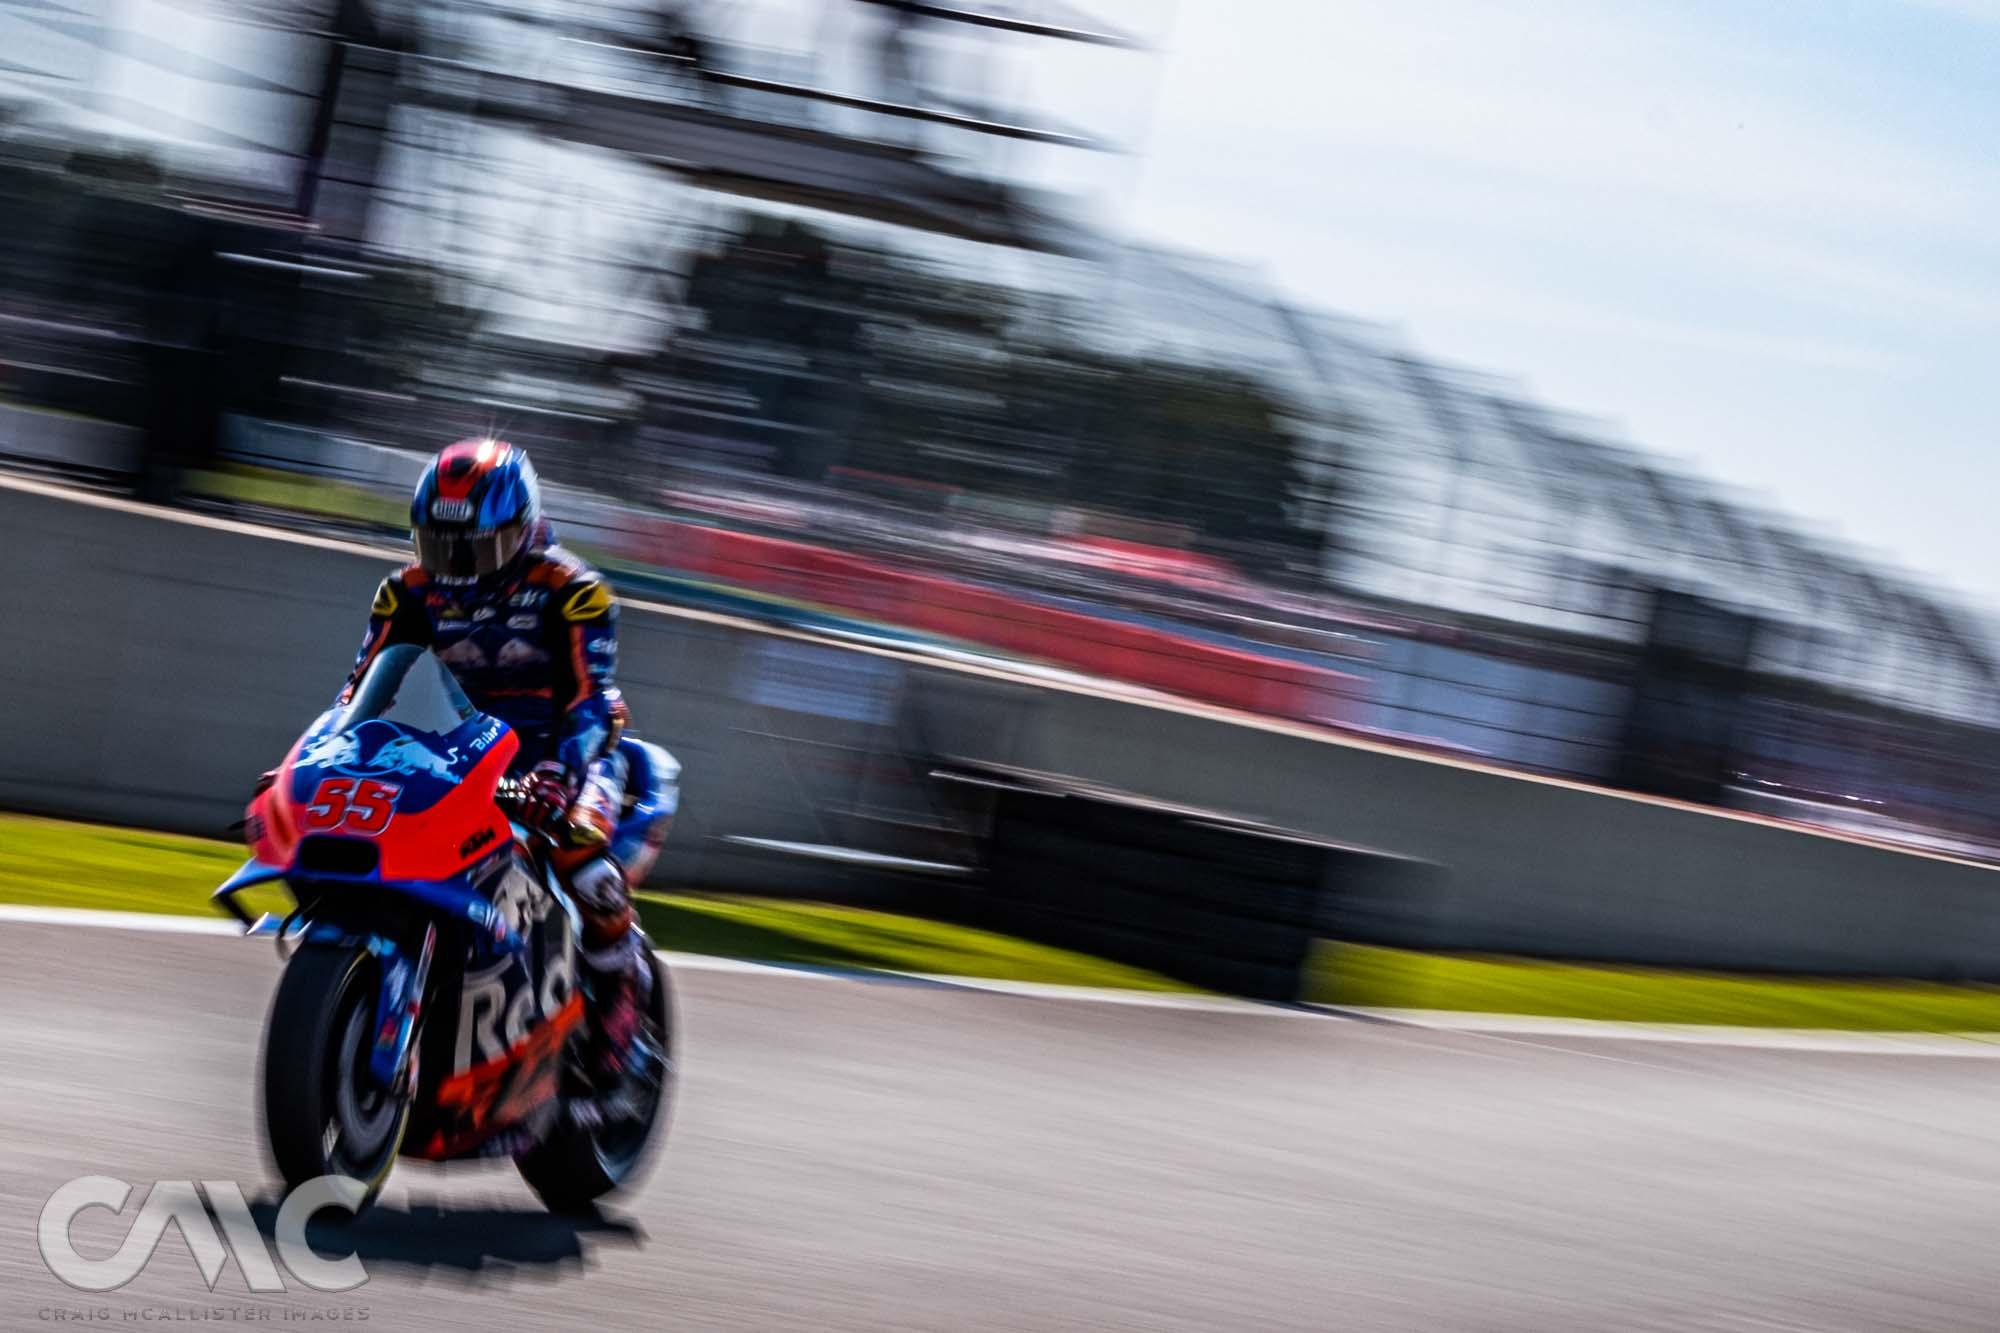 CMC_MotoGP_Qualifying_Silverstone 50-1405261.jpg